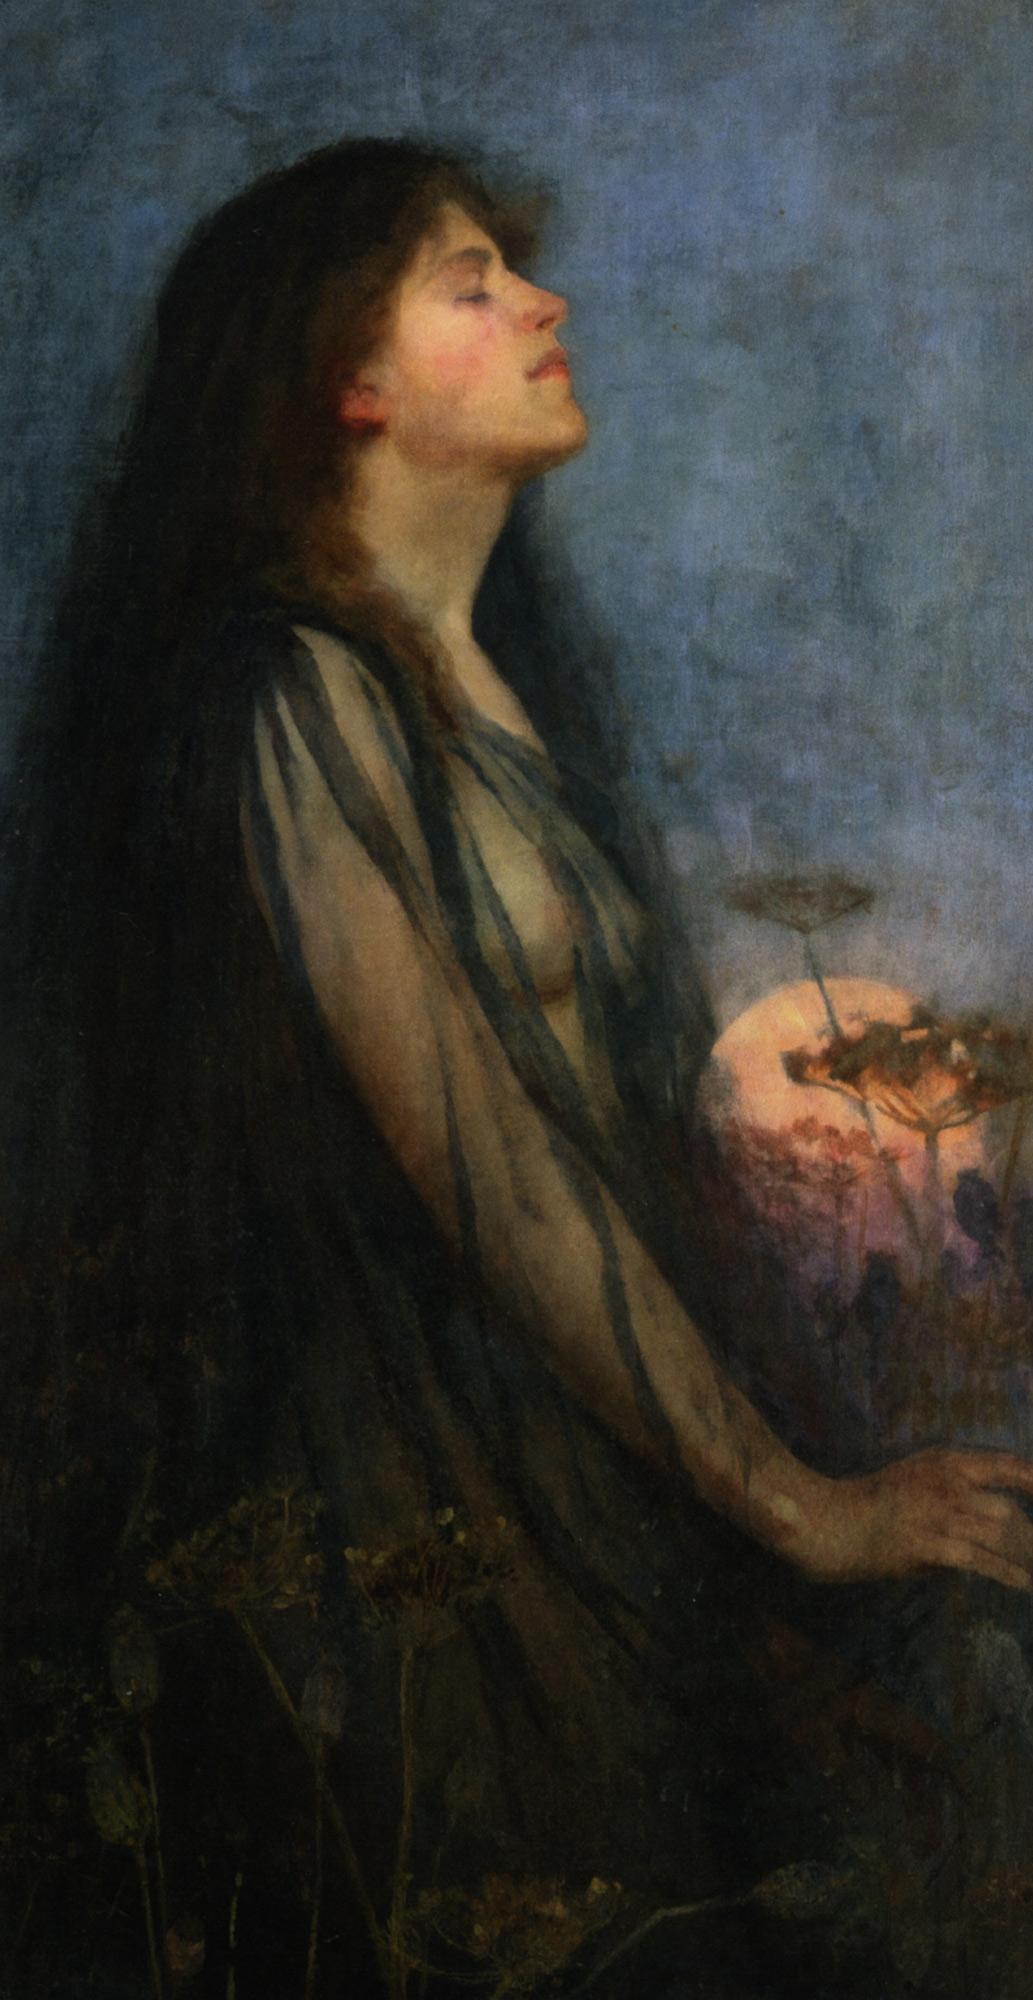 Evening :: Thomas Cooper Gotch  - Young beauties portraits in art and painting ôîòî